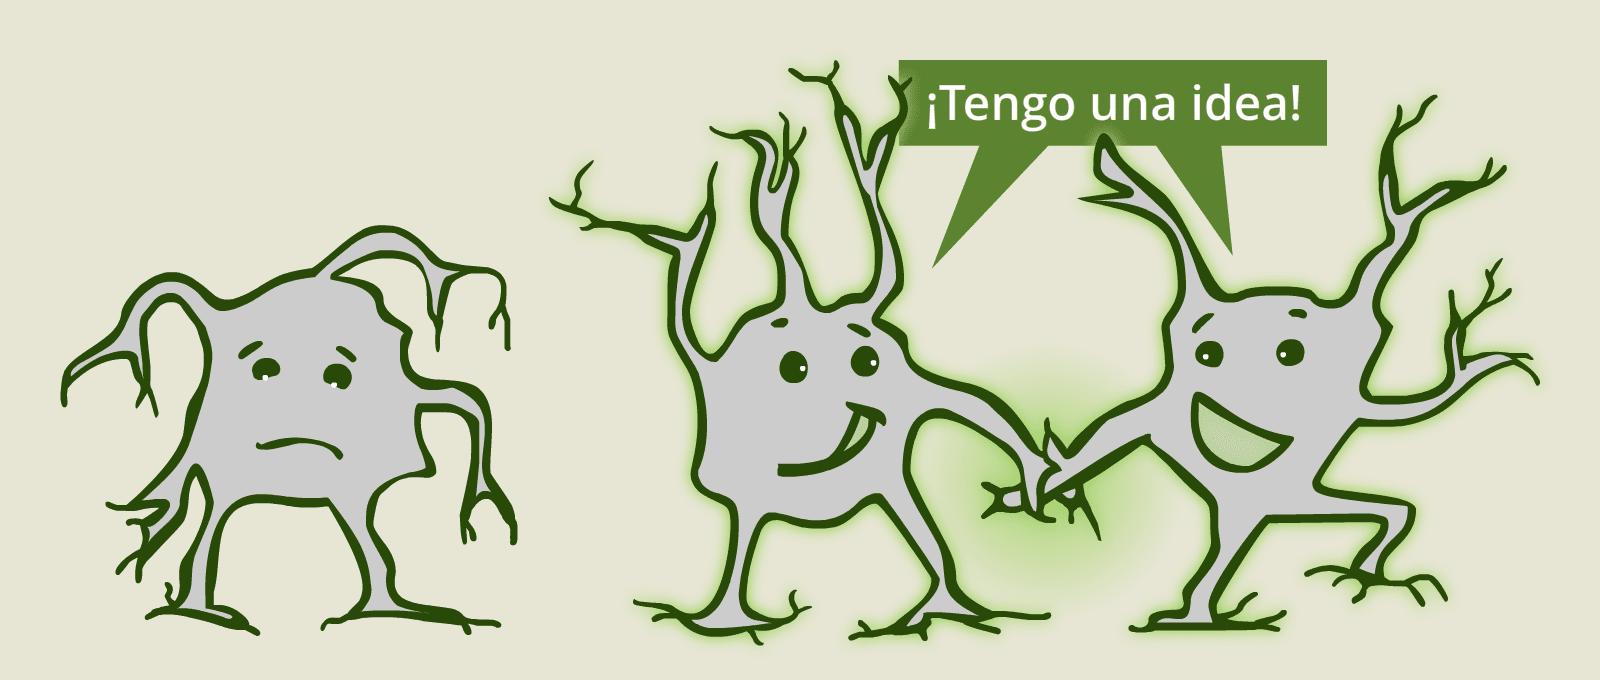 Neuronas abrazadas